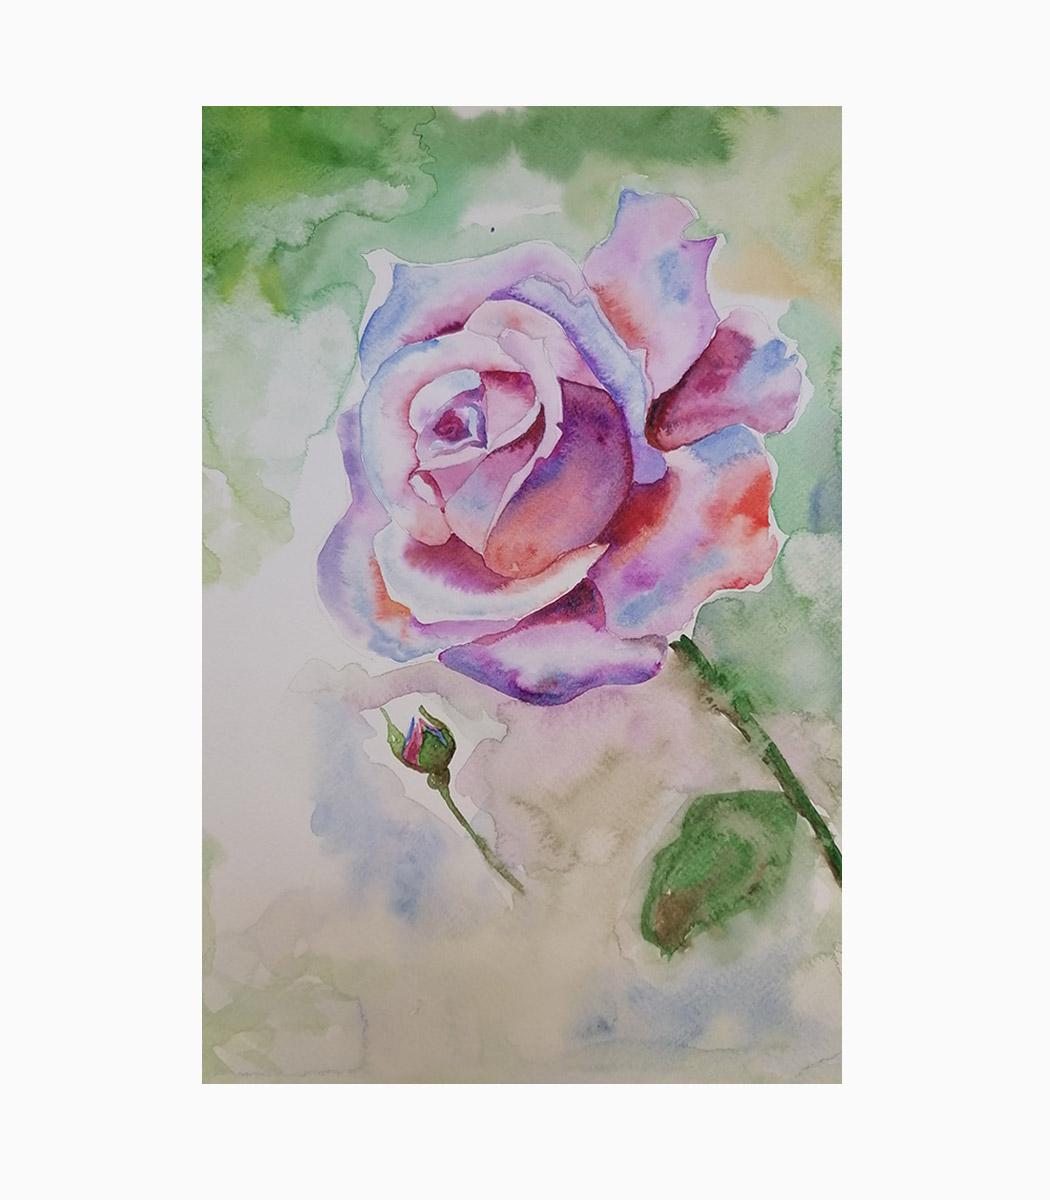 نقاشی آبرنگ گل رز